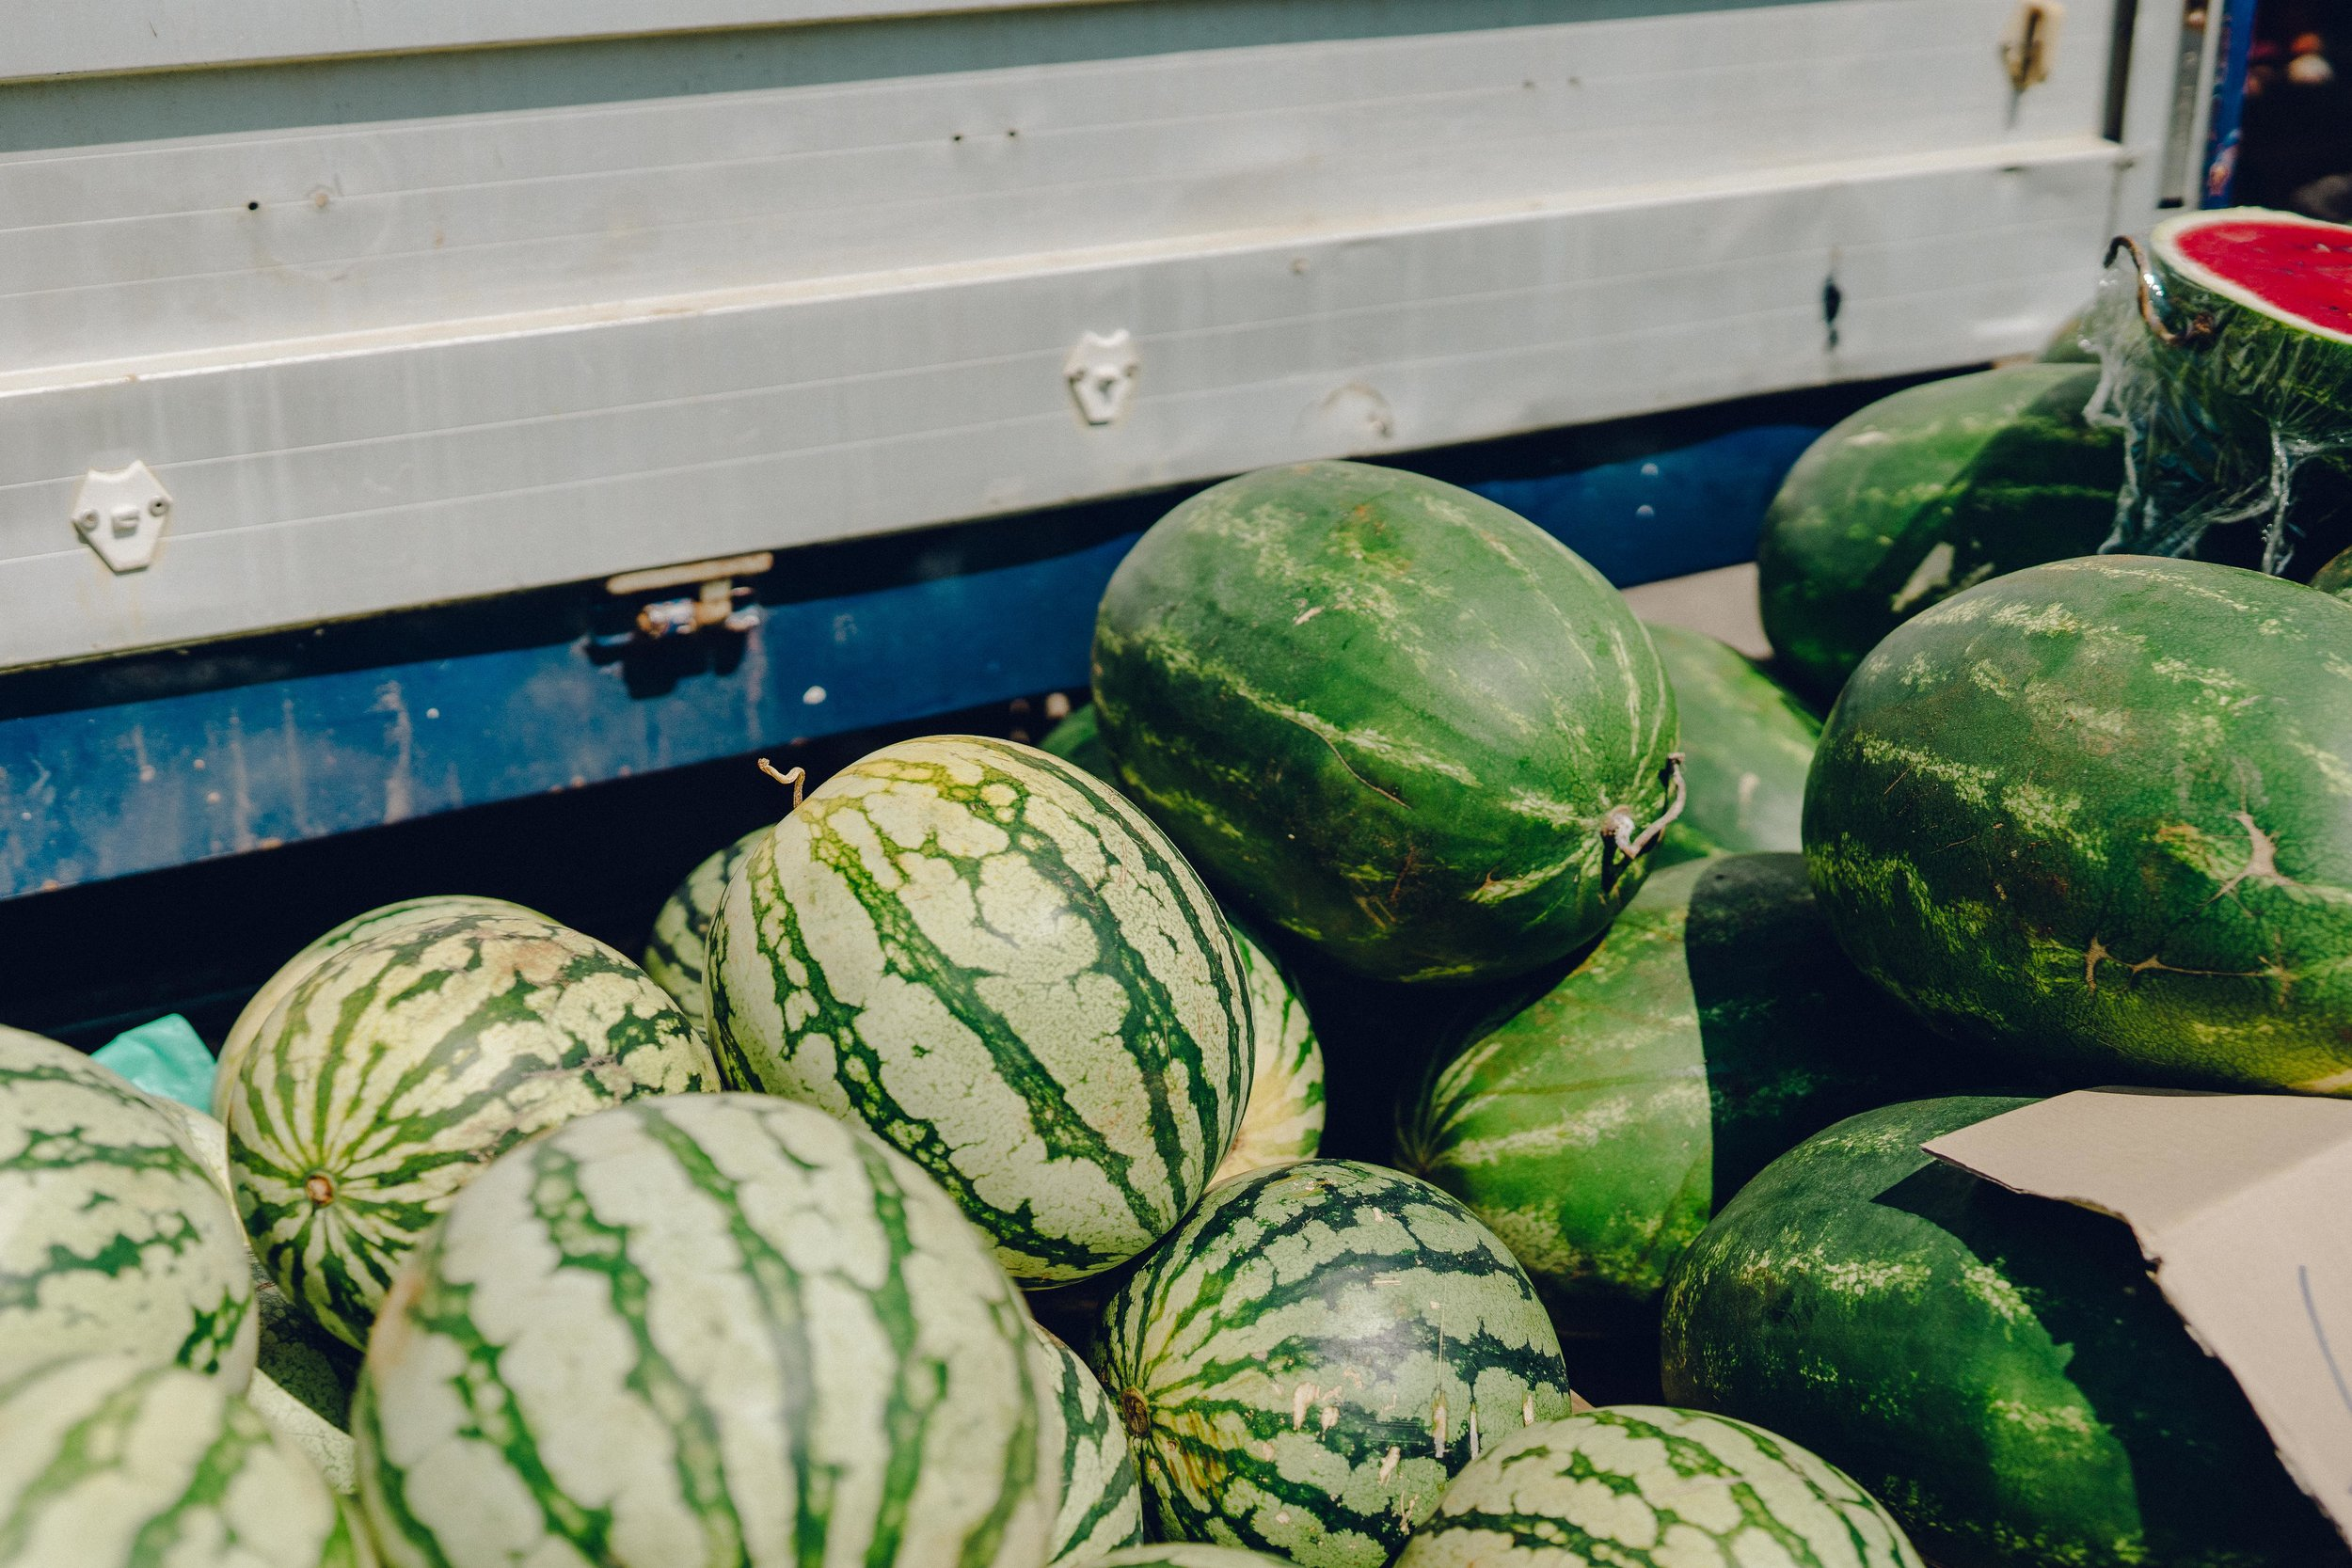 ASROSENVINGE_Roadtrip_Italy_Puglia_Martinafranca_Market_Watermelons-07201.jpg